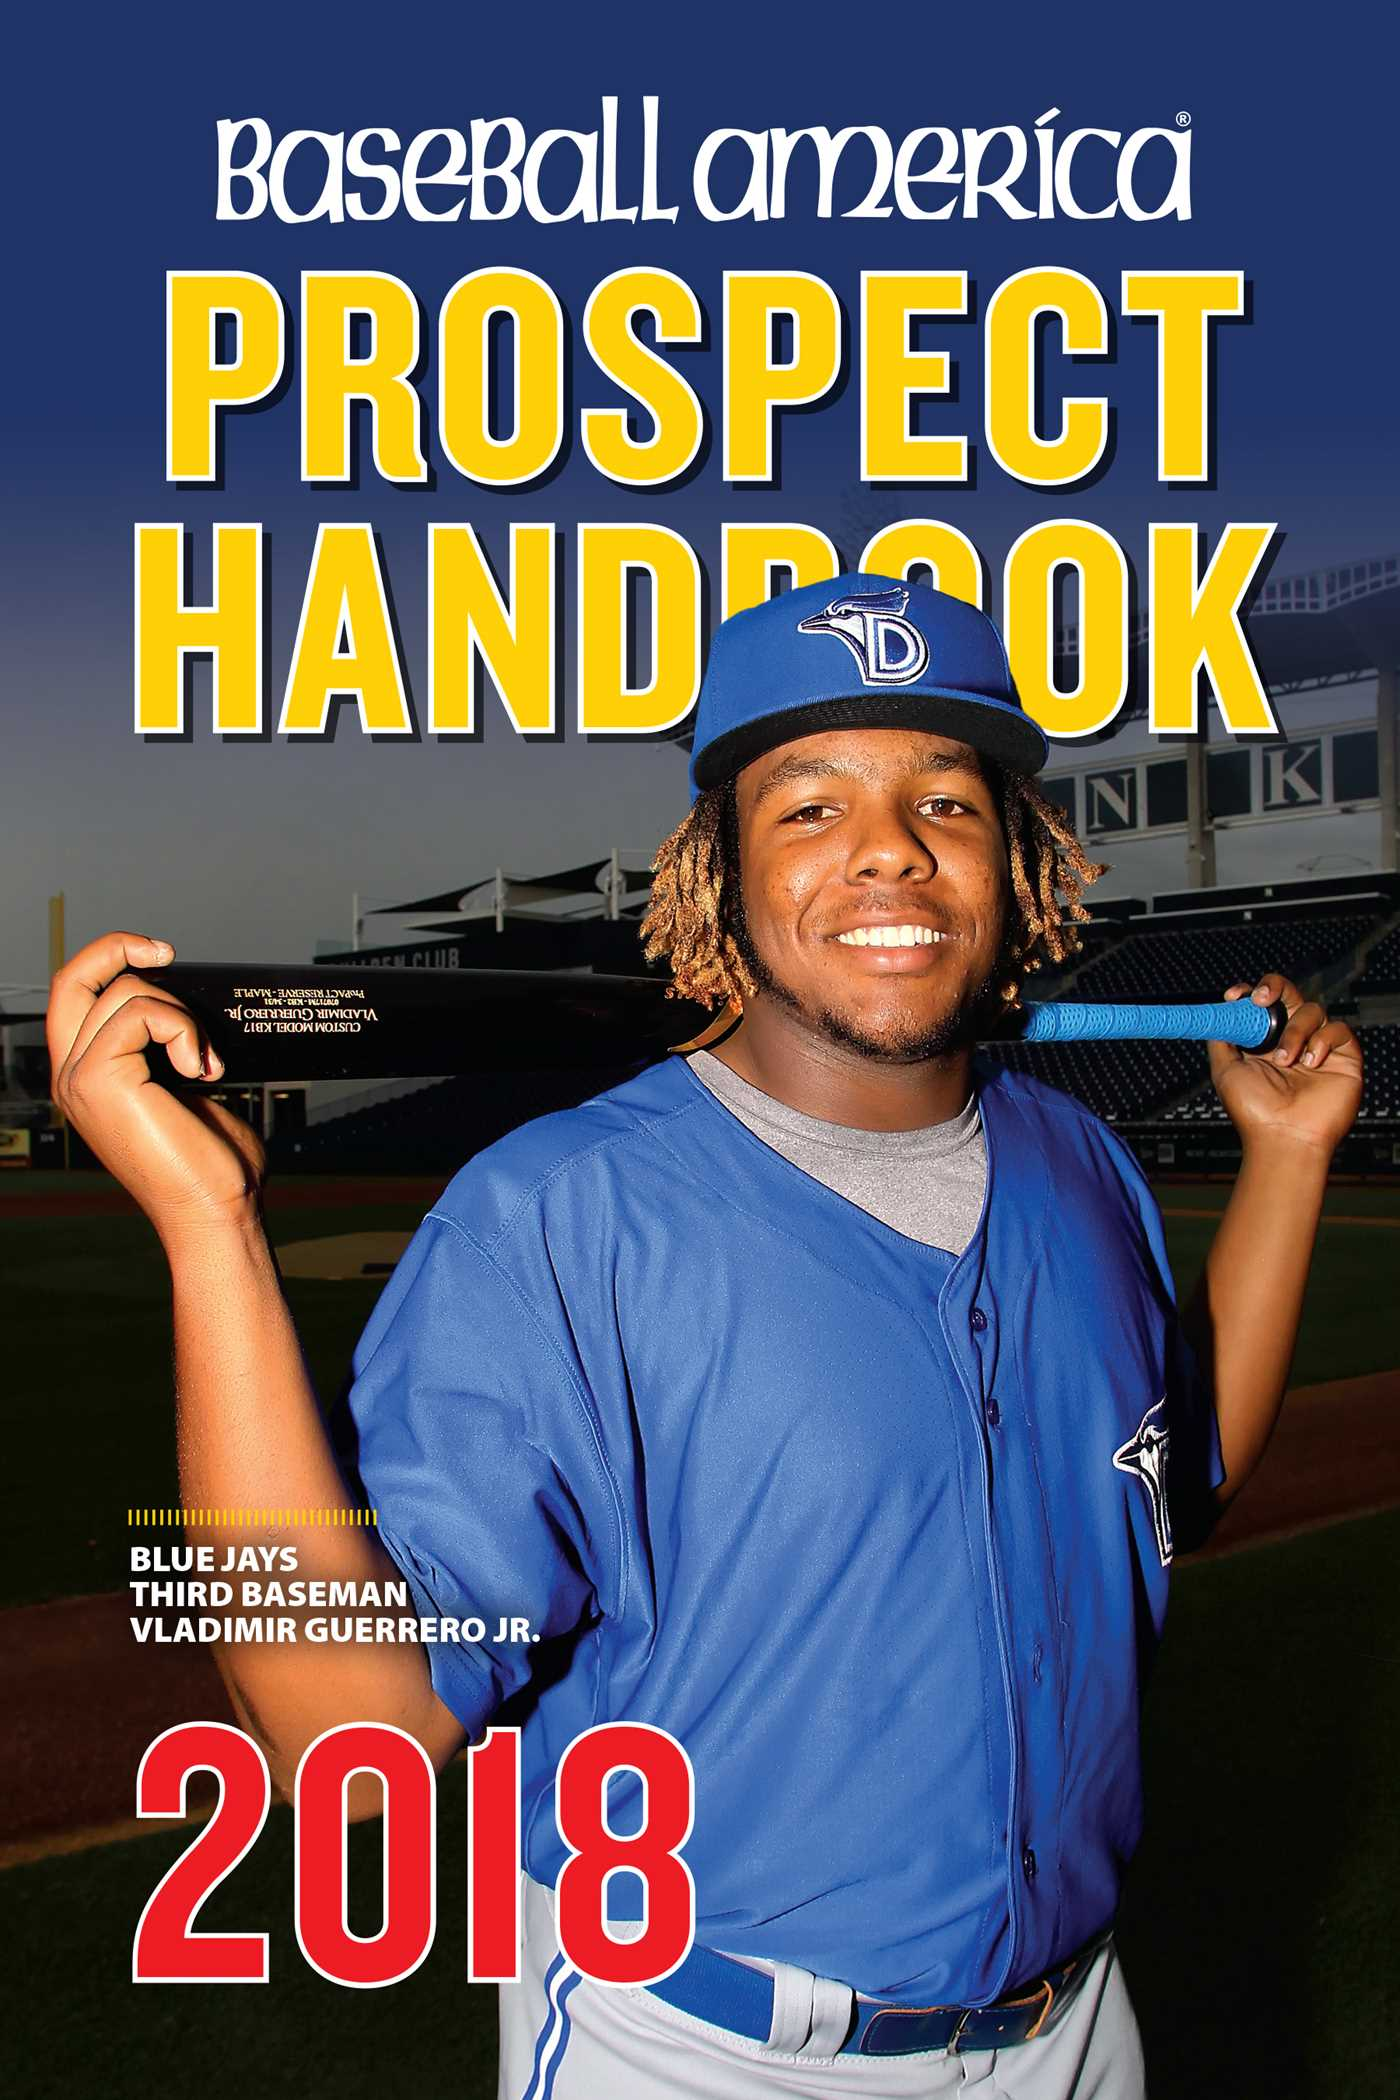 Baseball america 2018 prospect handbook 9781932391763 hr